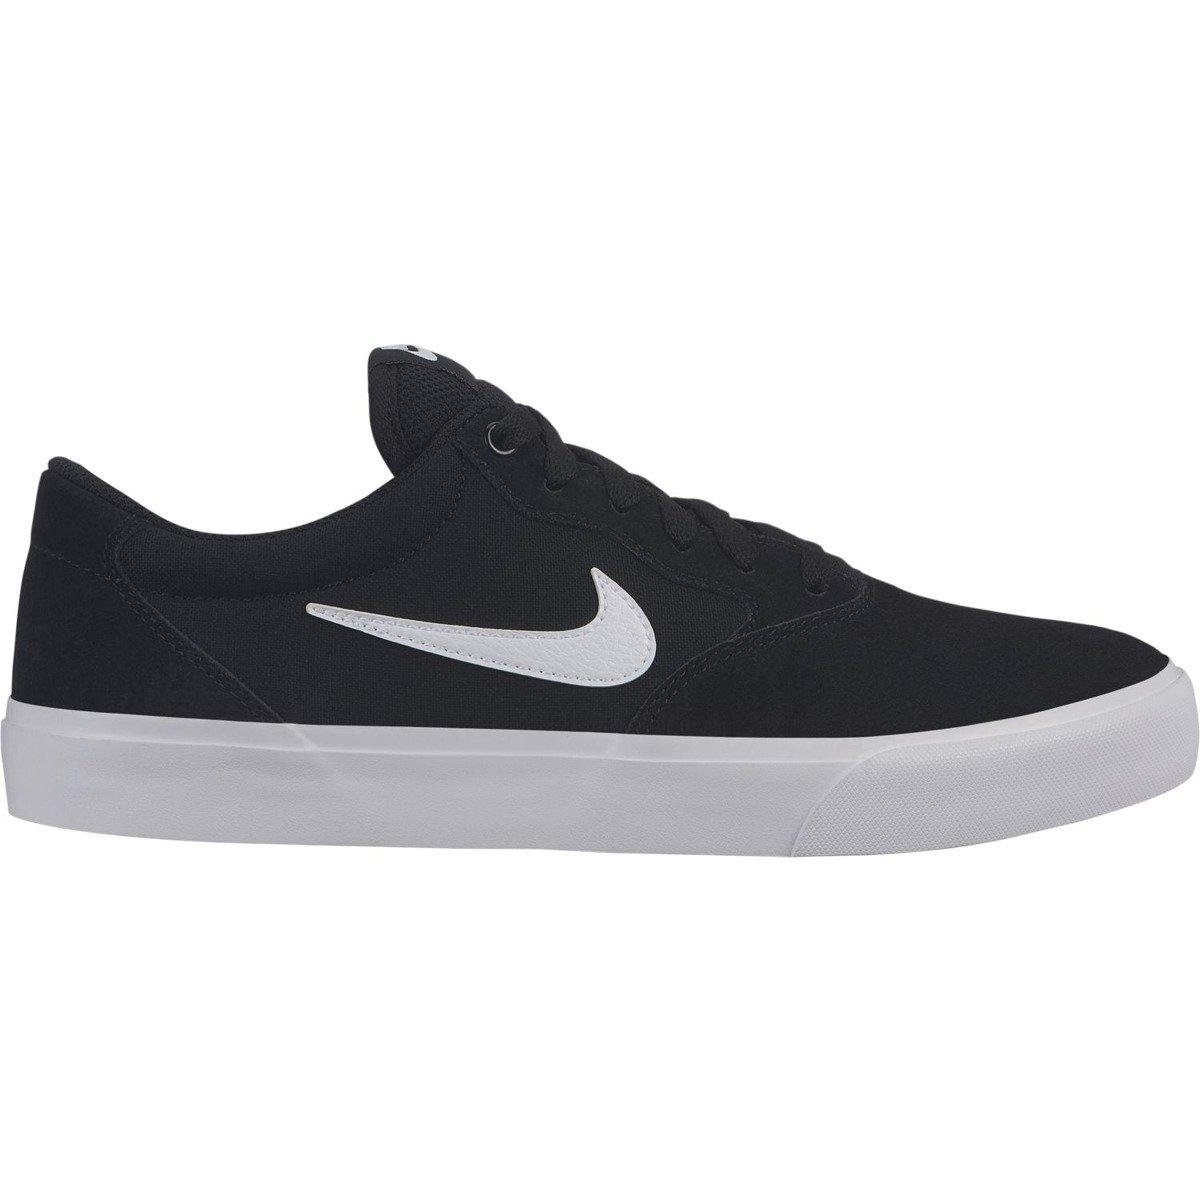 Processo di fabbricazione stradale Estrazione gemello  Nike Sb Chron Slr Black/white BLACK | Shoes \ Nike SB Brands \ Nike SB ALL  | Skateshop Miniramp.pl